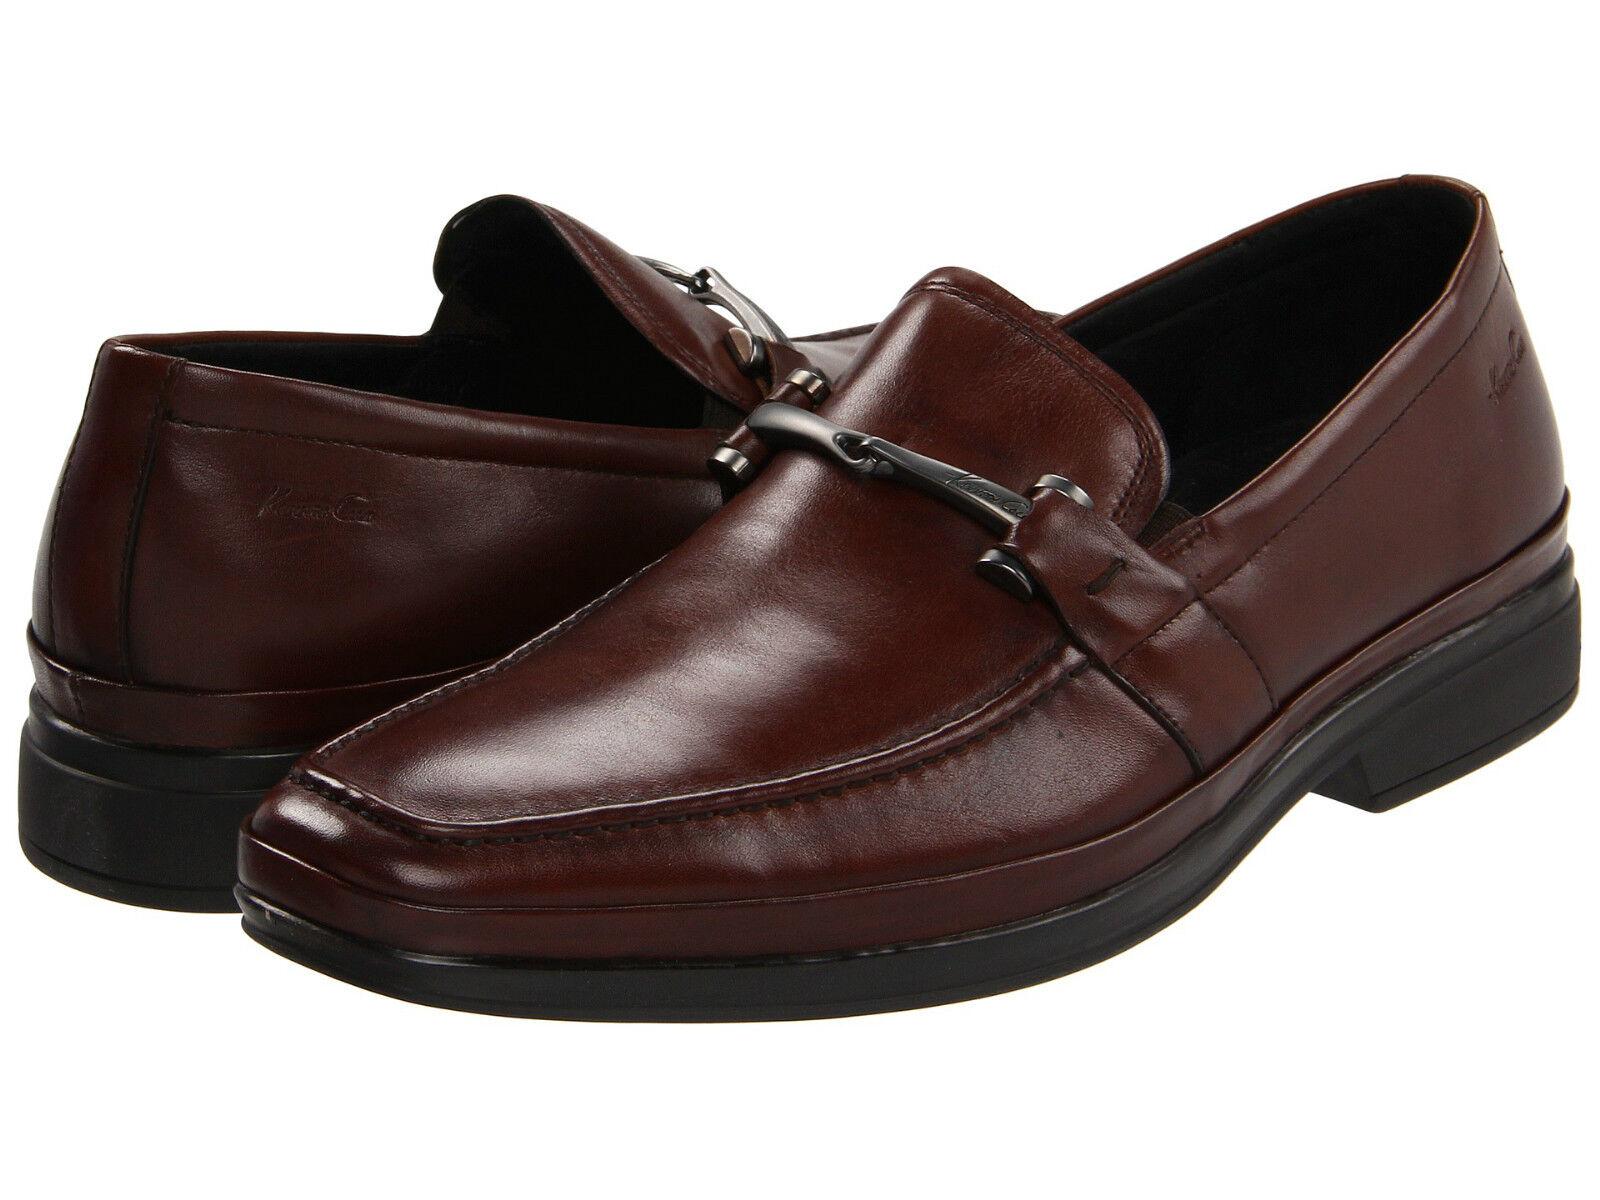 New Size 11.5 KENNETH COLE Pelle Uomo Shoe! Reg 158 Sale 69.99 LastPair!